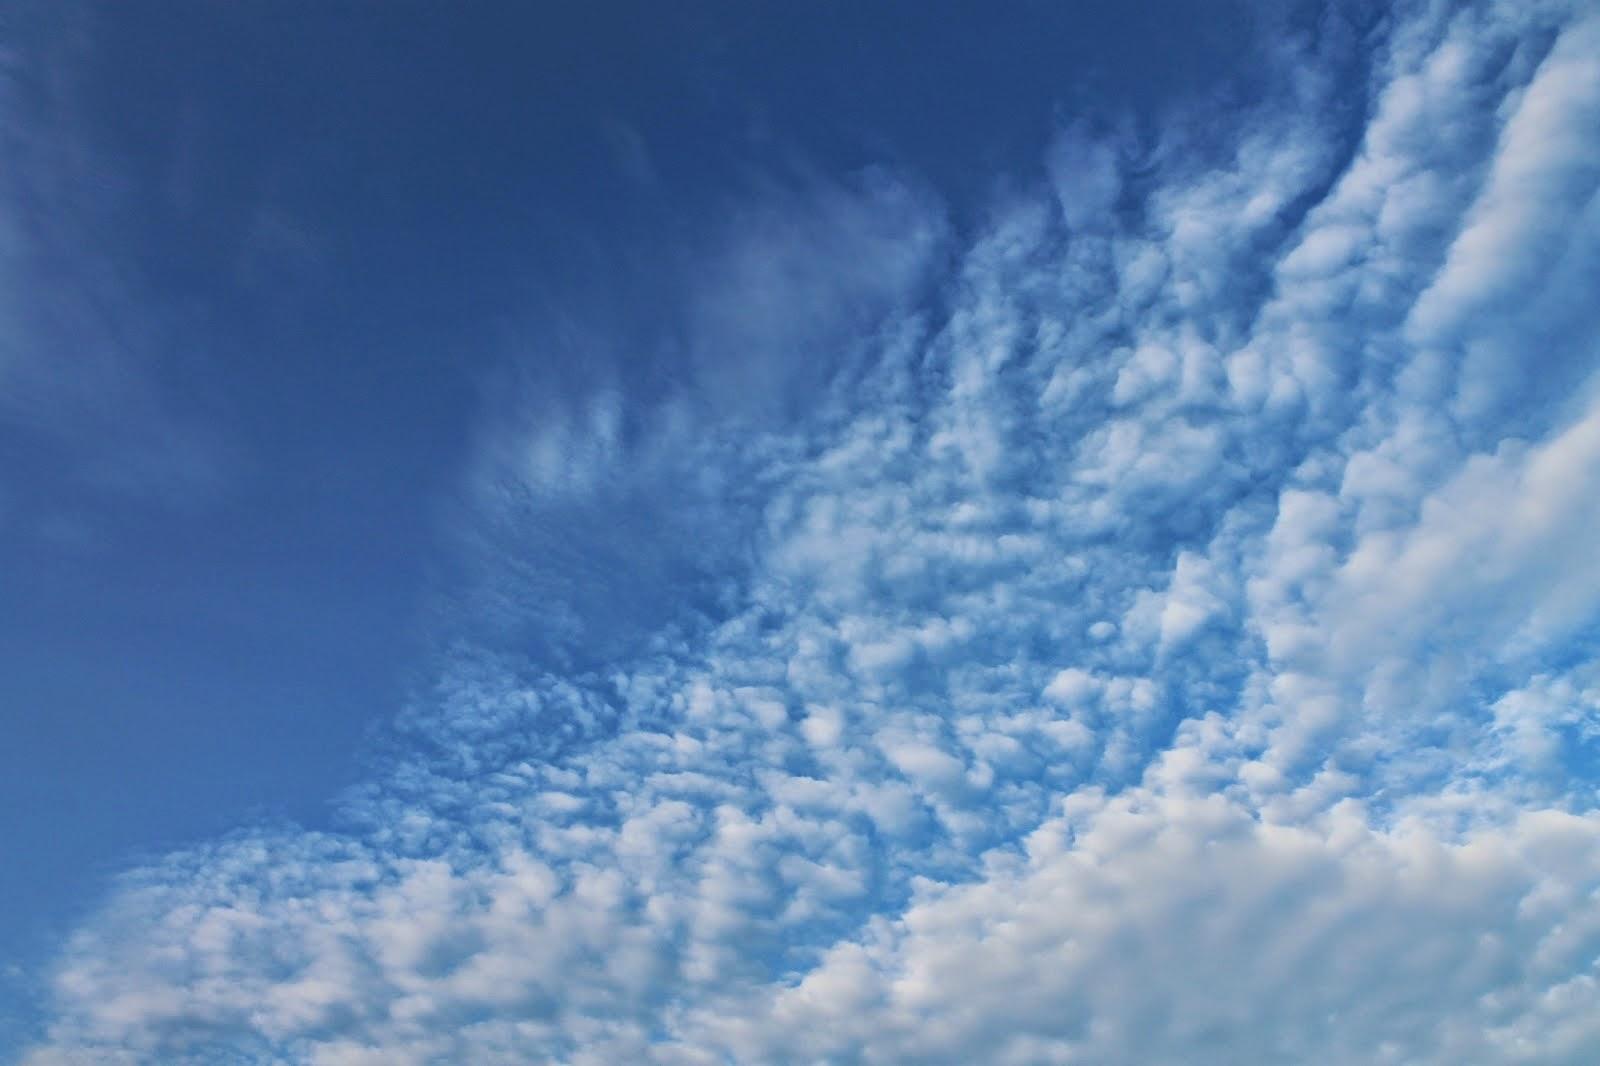 Langit Berwarna biru Akibat Efek Tyndal